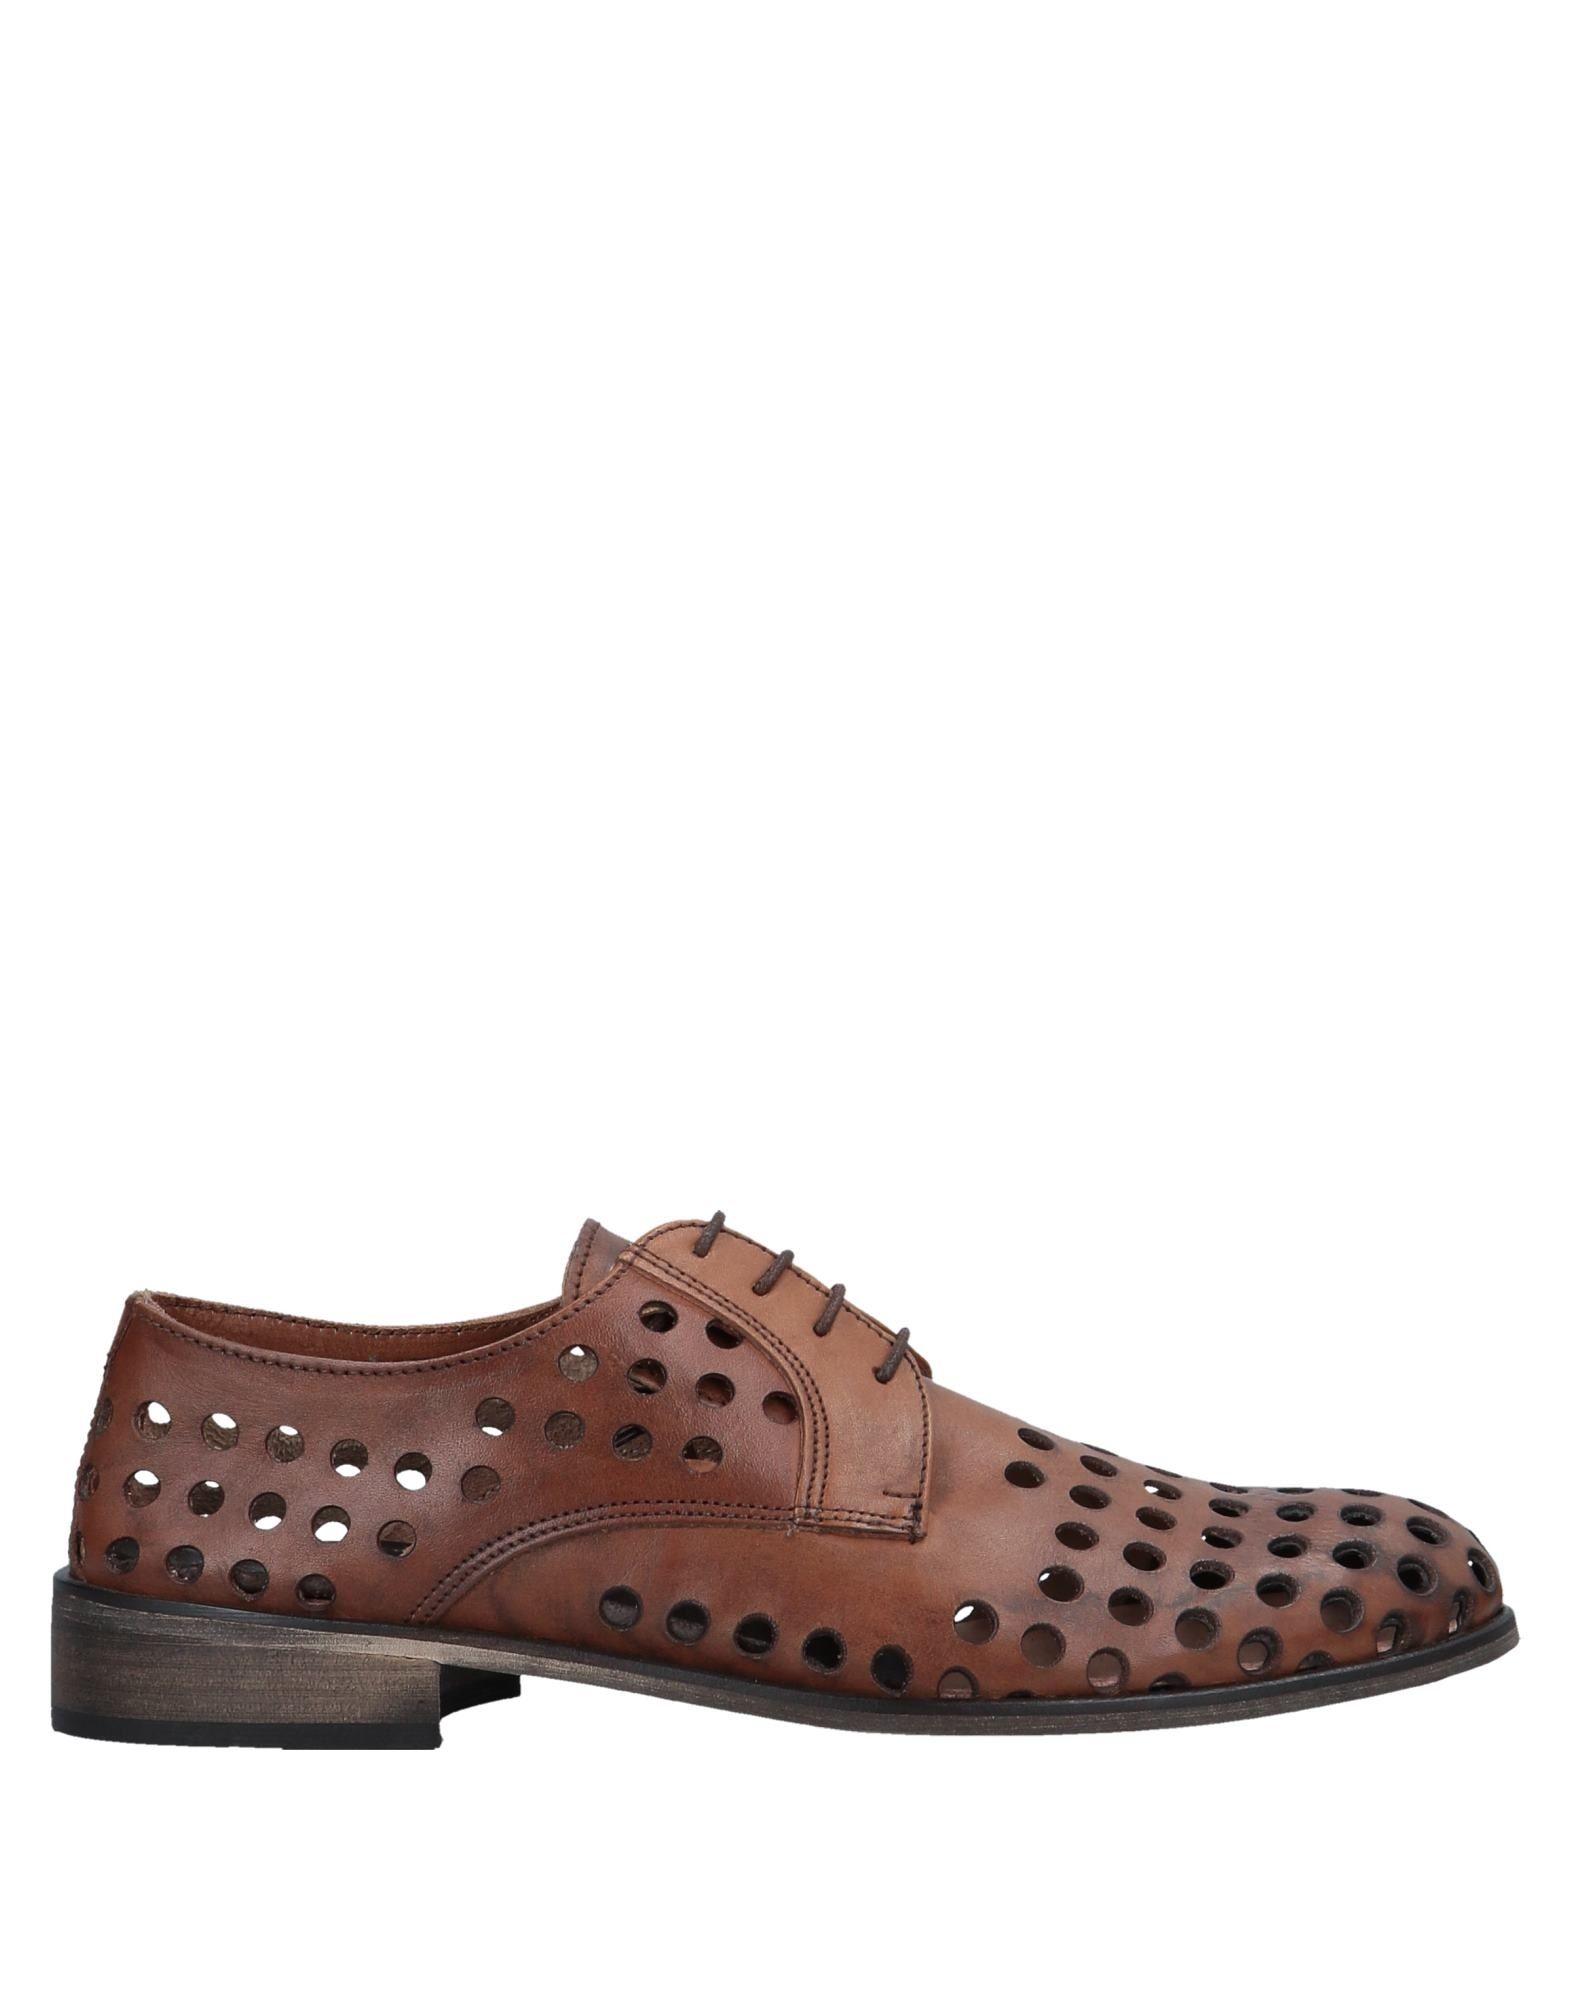 DANIELE ALESSANDRINI Обувь на шнурках amato daniele обувь на шнурках